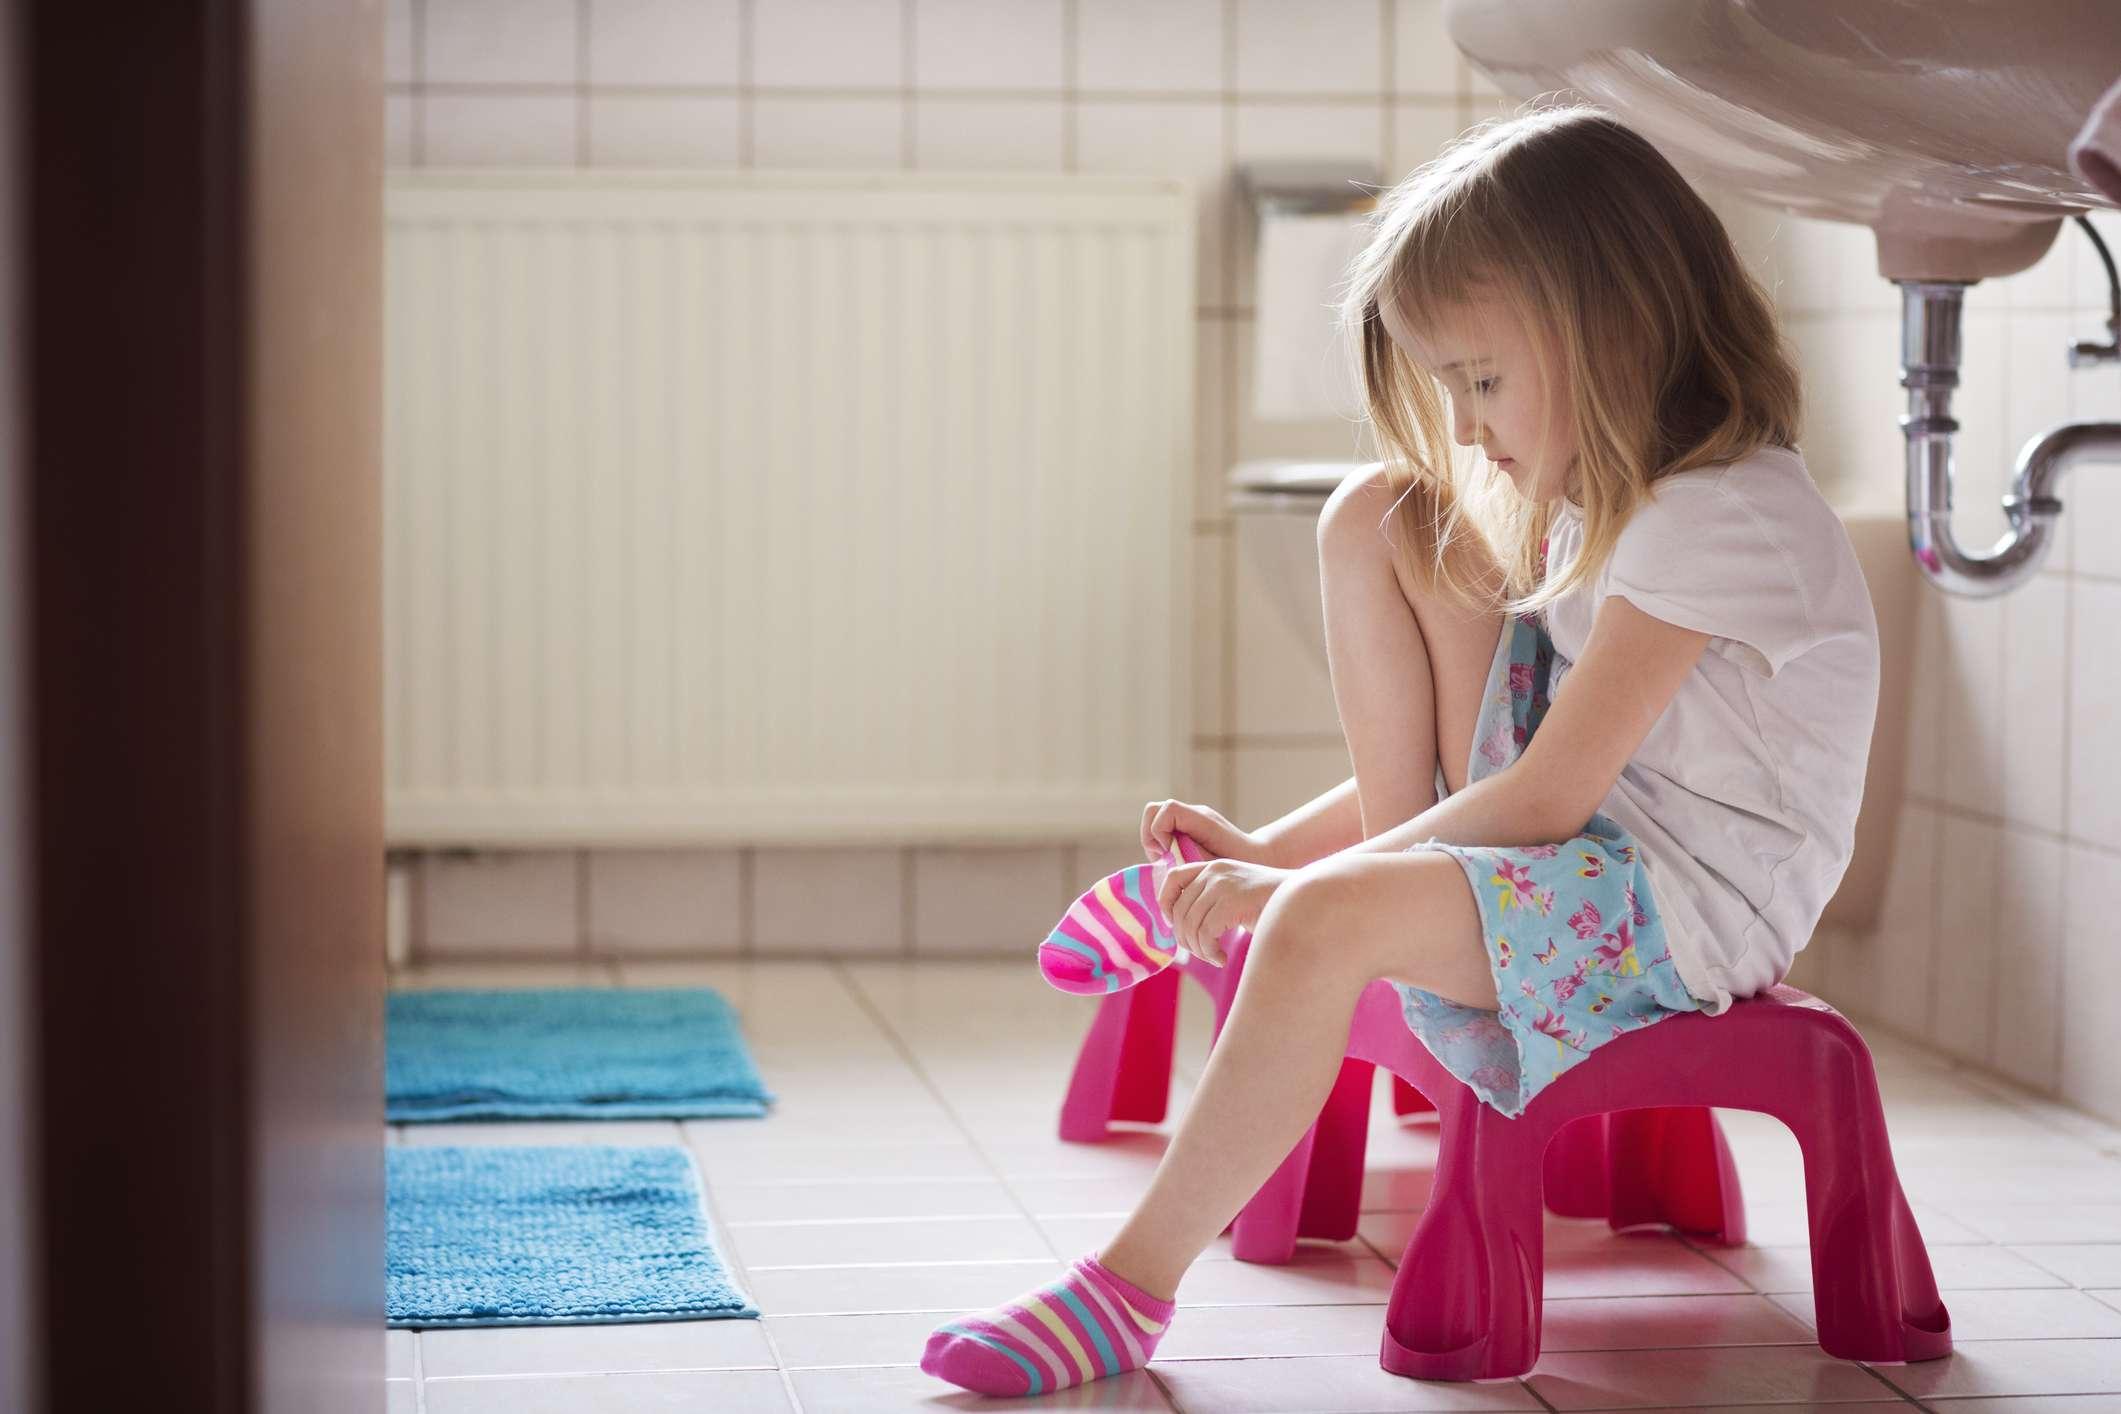 Girl (4-5) putting socks on independently